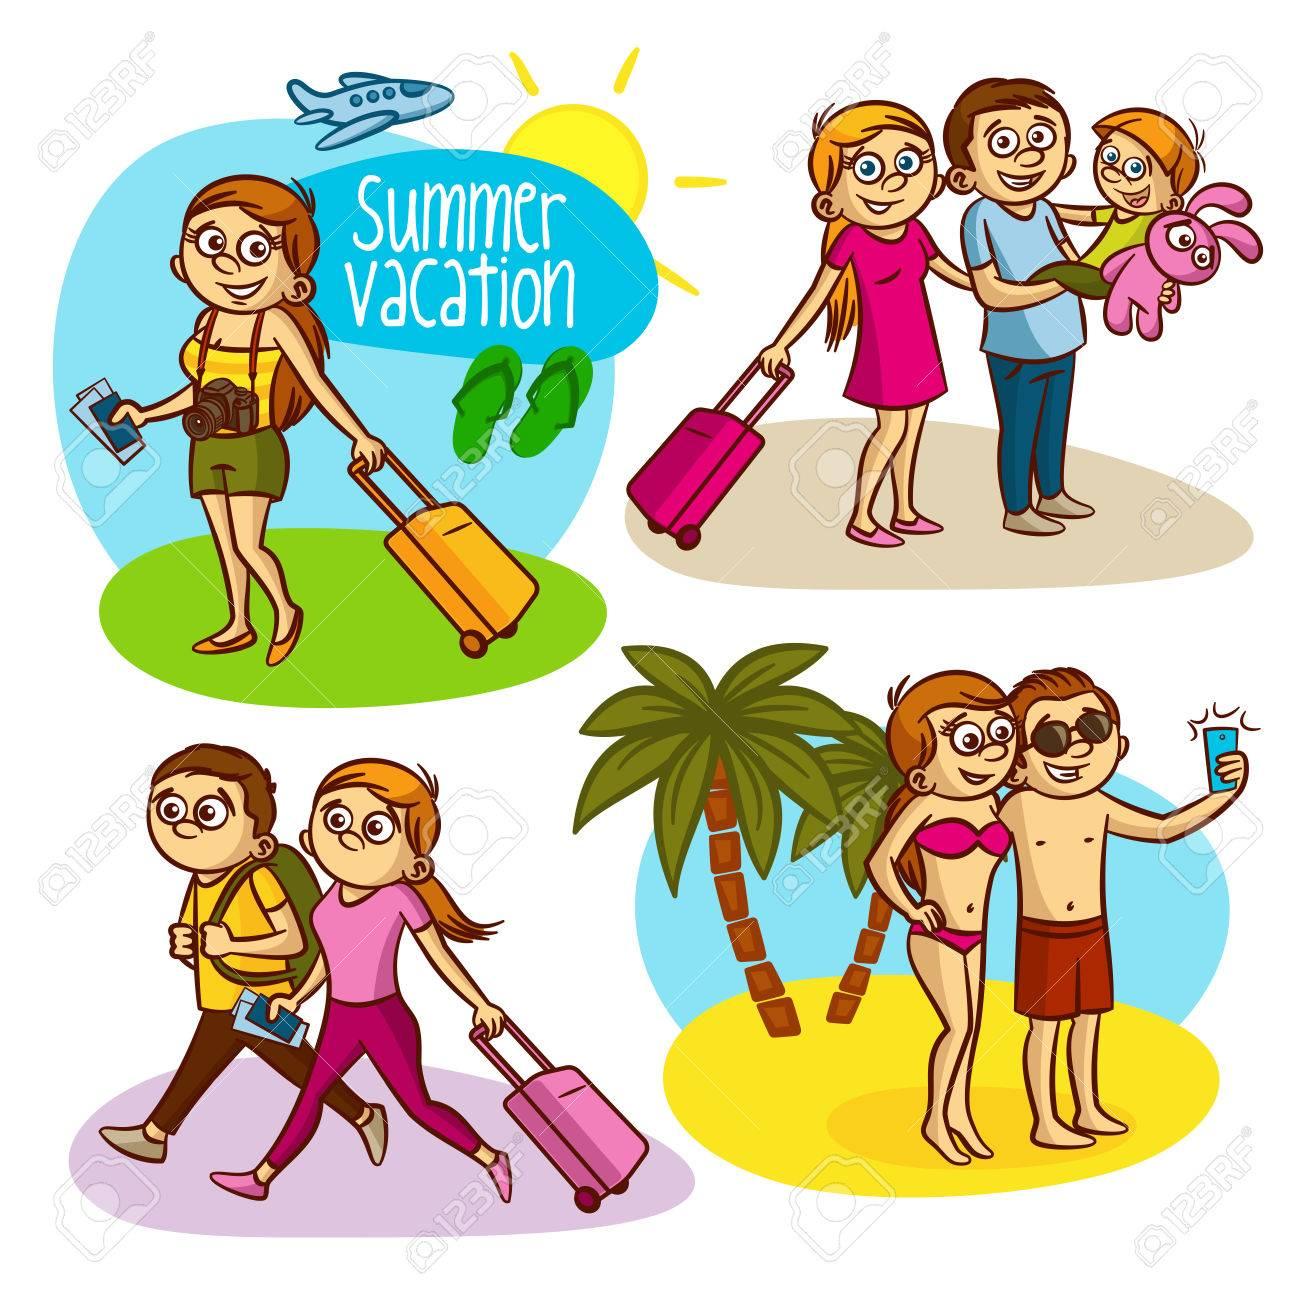 Summer Vacation Travel Family Clipart Stock Vector